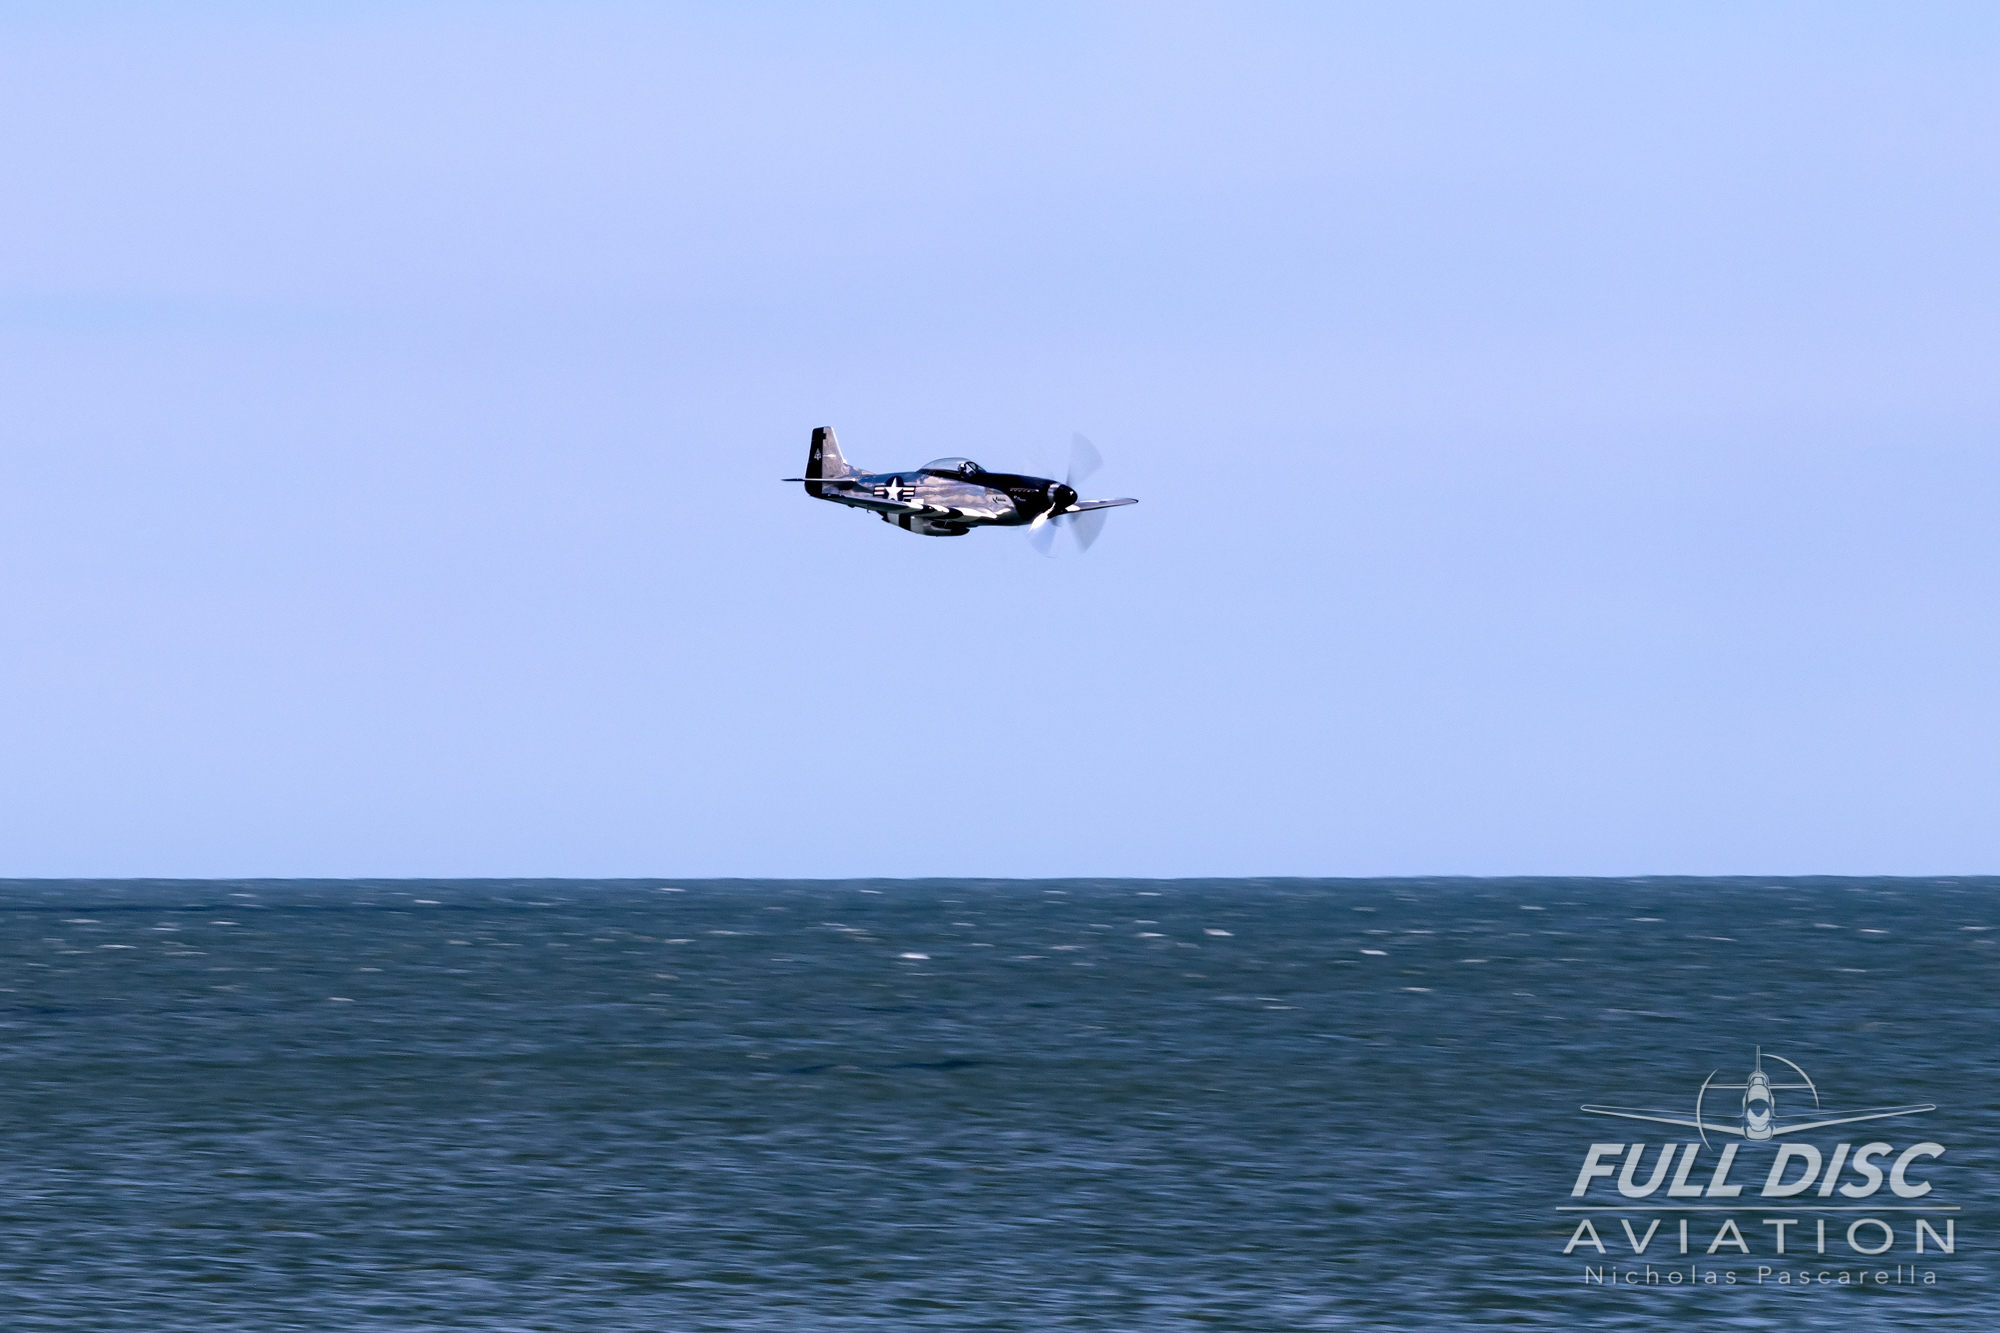 nickpascarella_fulldiscaviation_oceancityairshow_aviation_quicksilver_p51.jpg